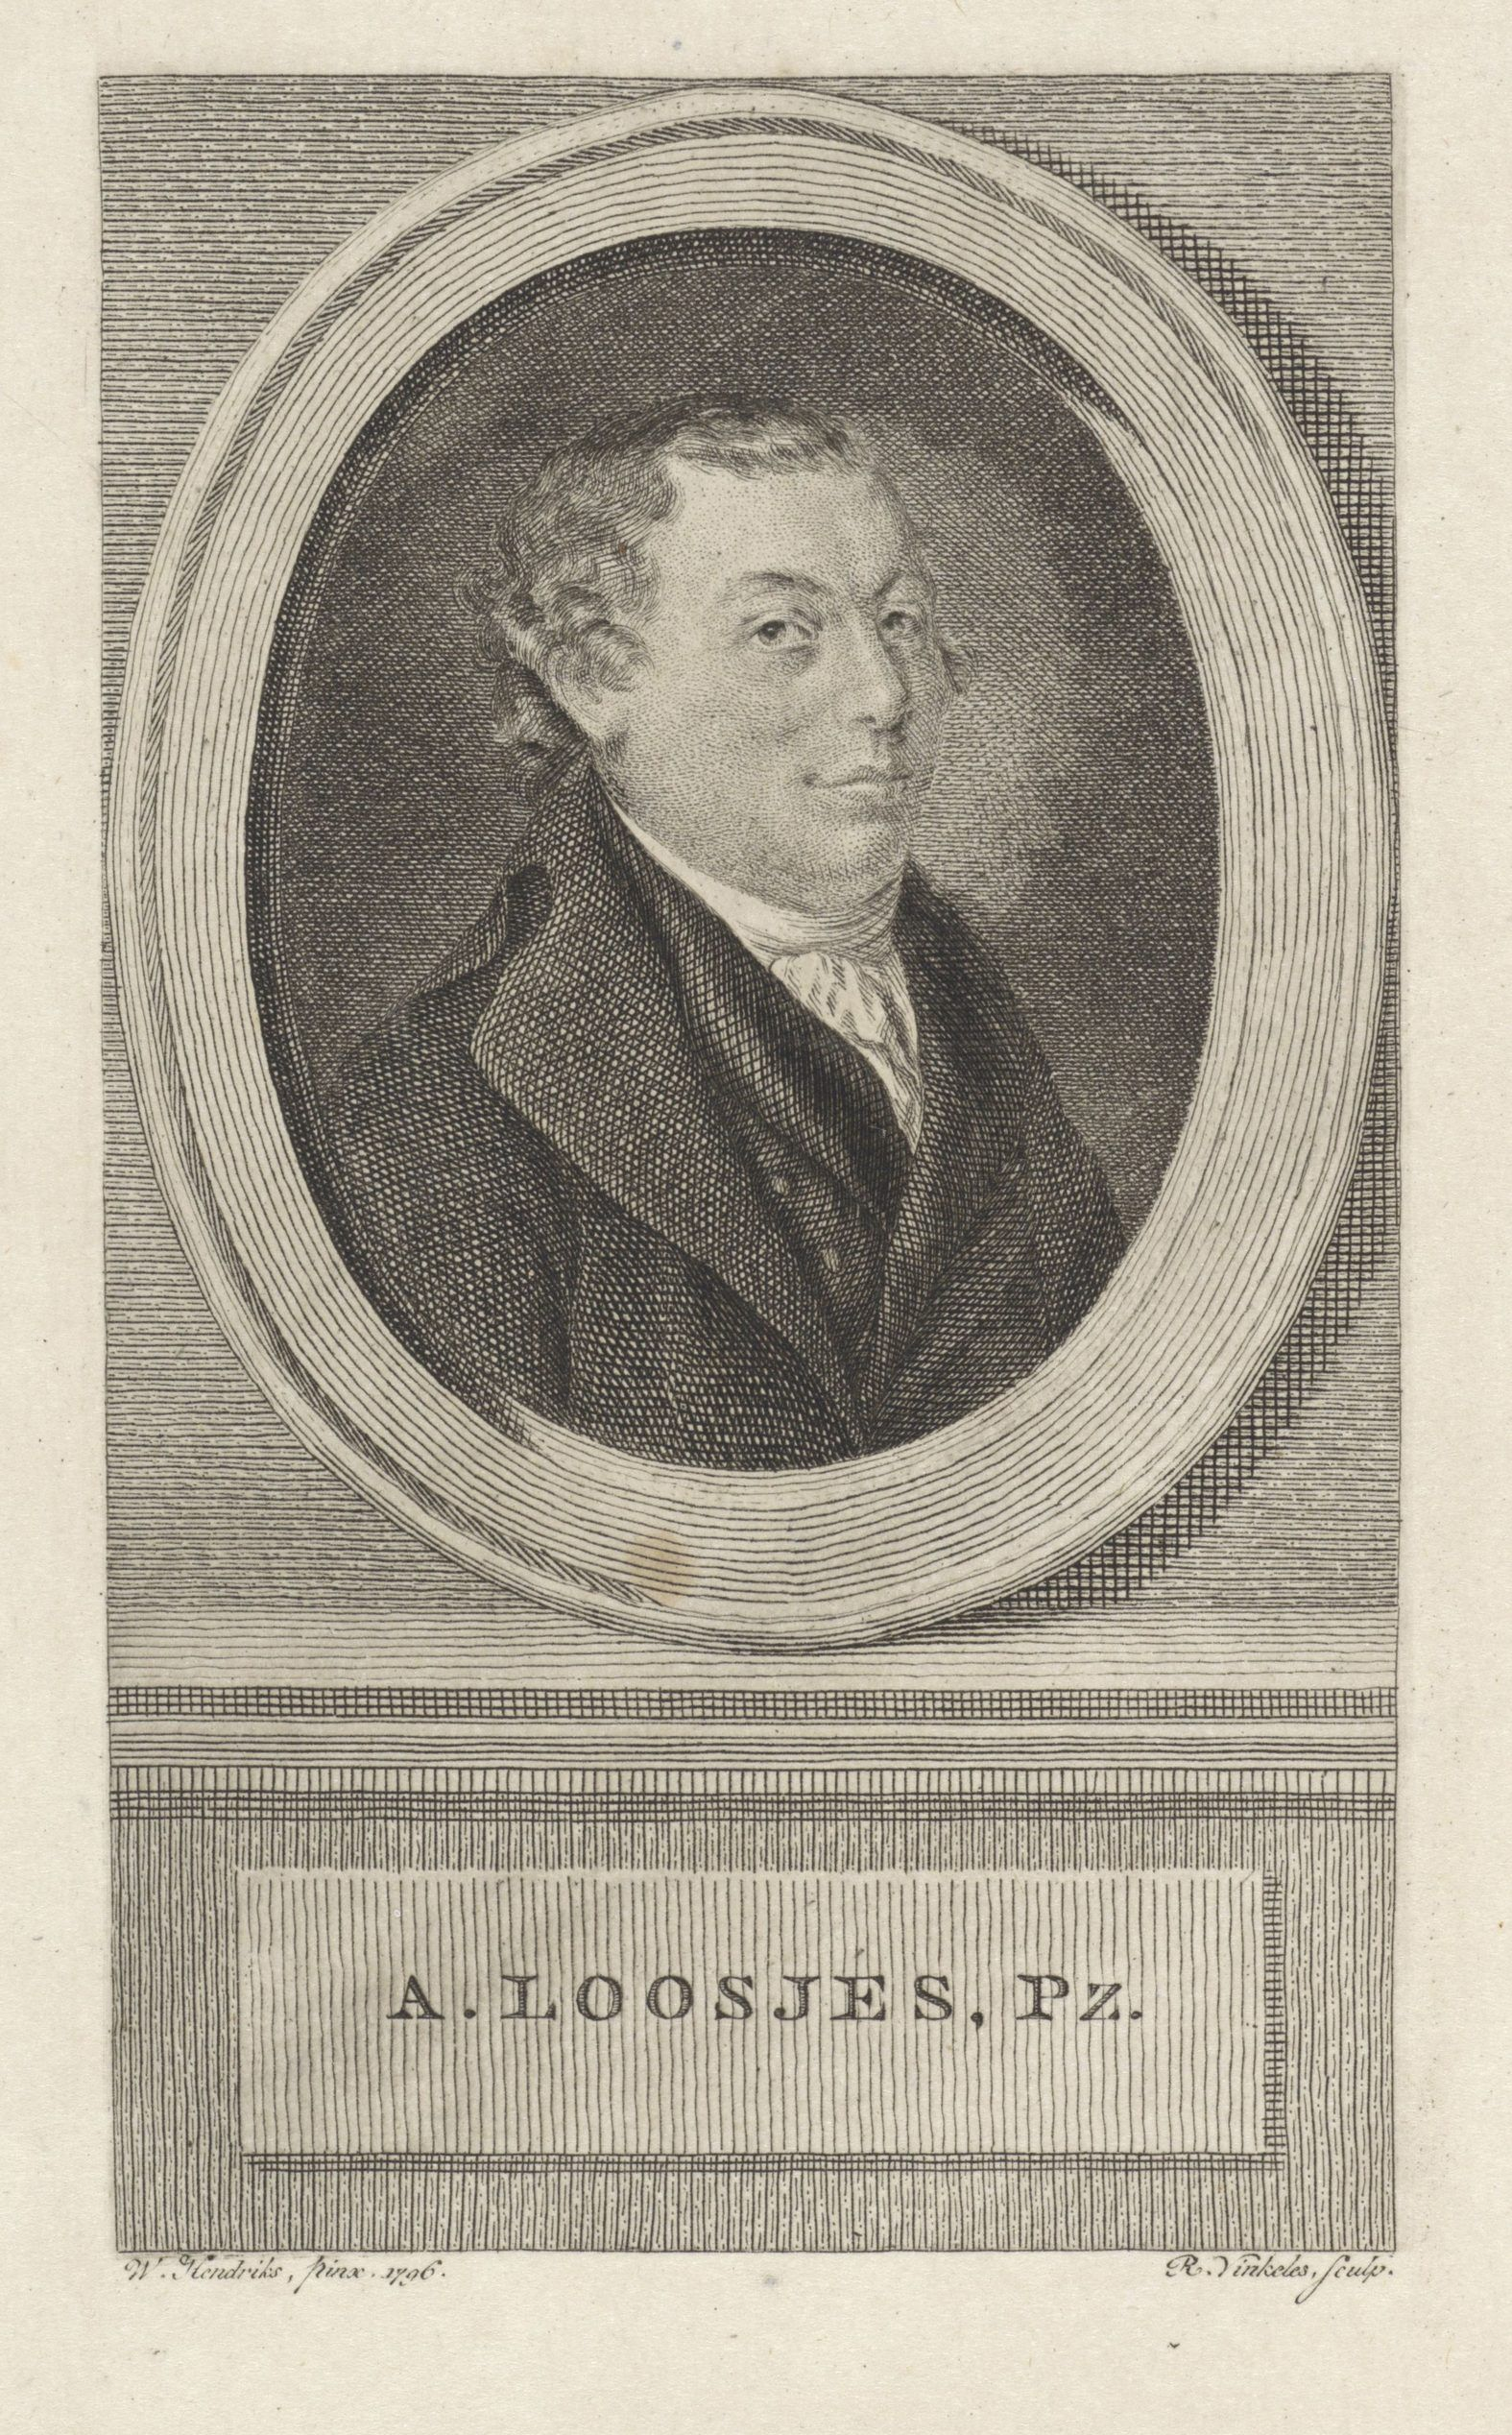 Adriaan Loosjes in 1796 (Reinier Vinkeles)